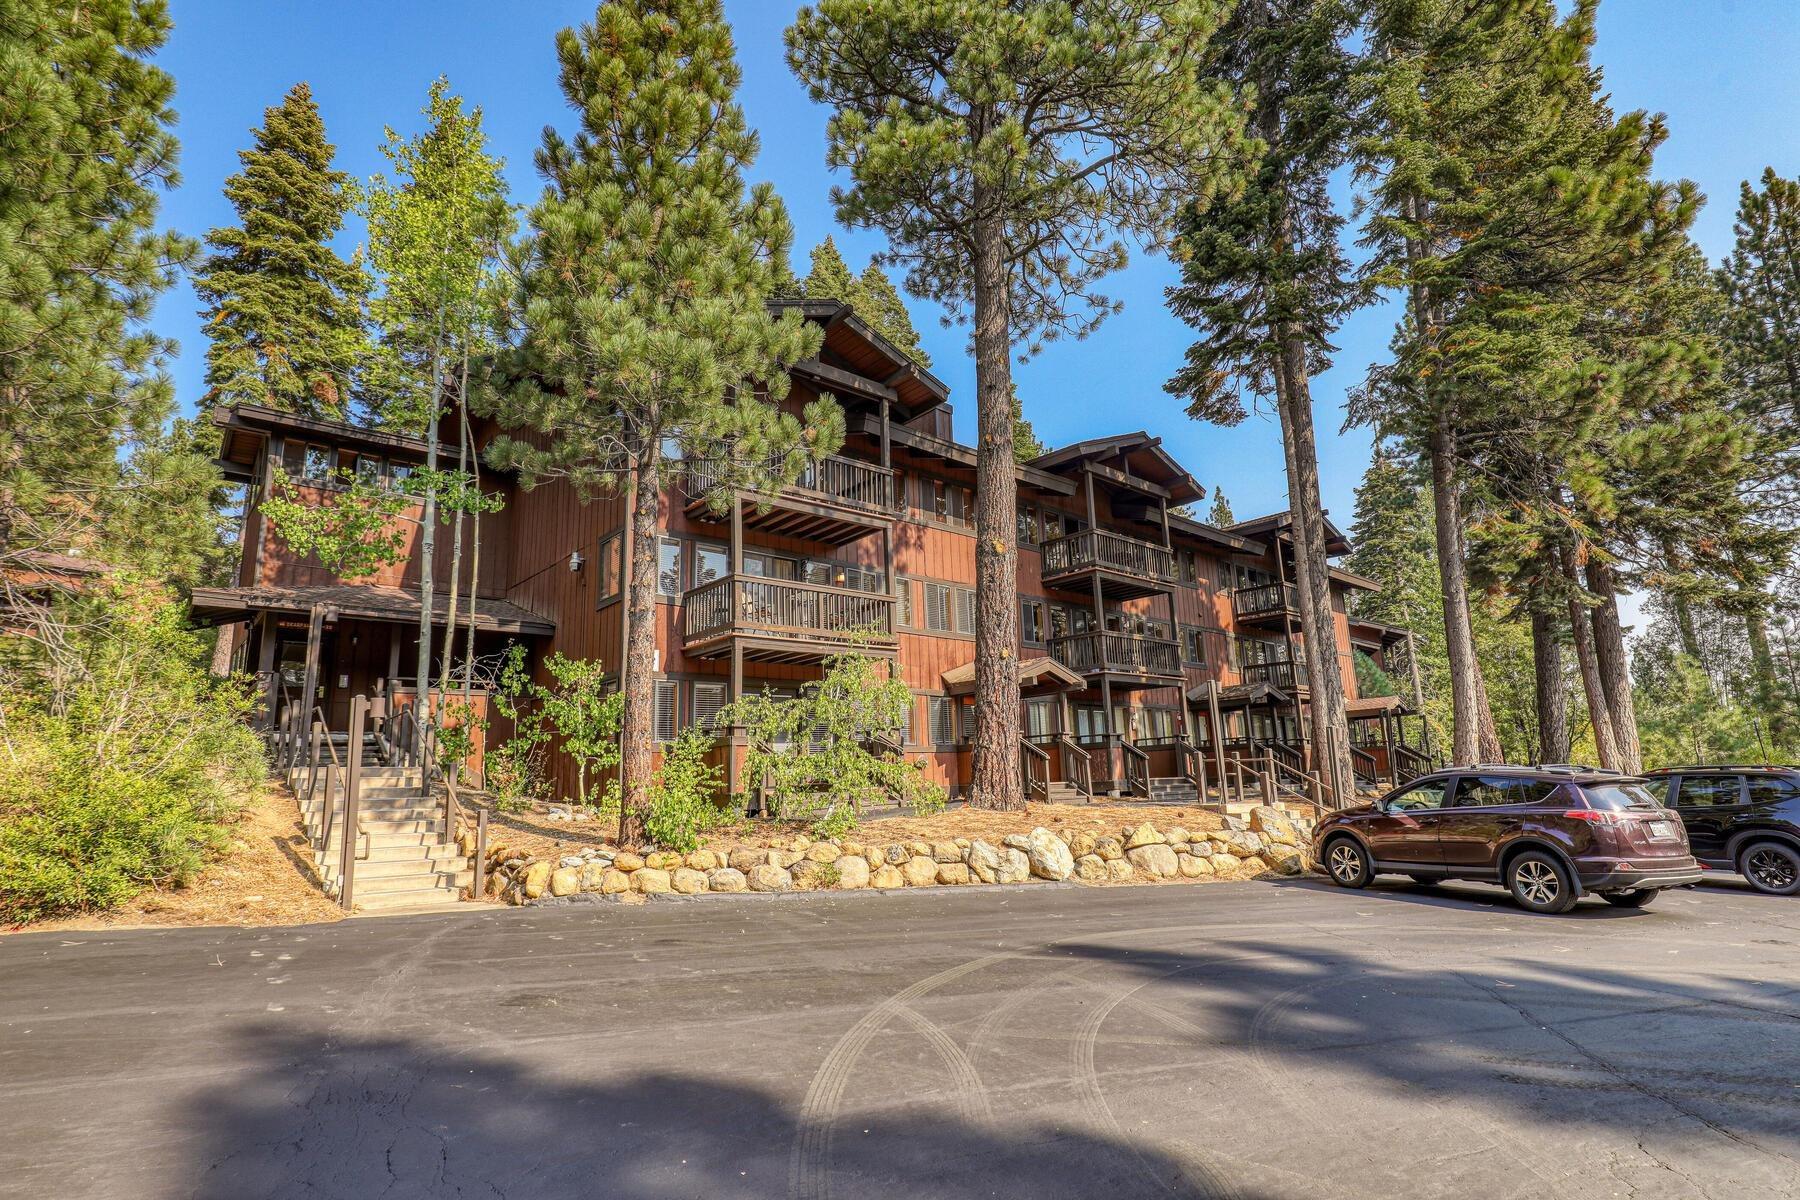 Image for 725 Granlibakken Road, Tahoe City, CA 96145-9999